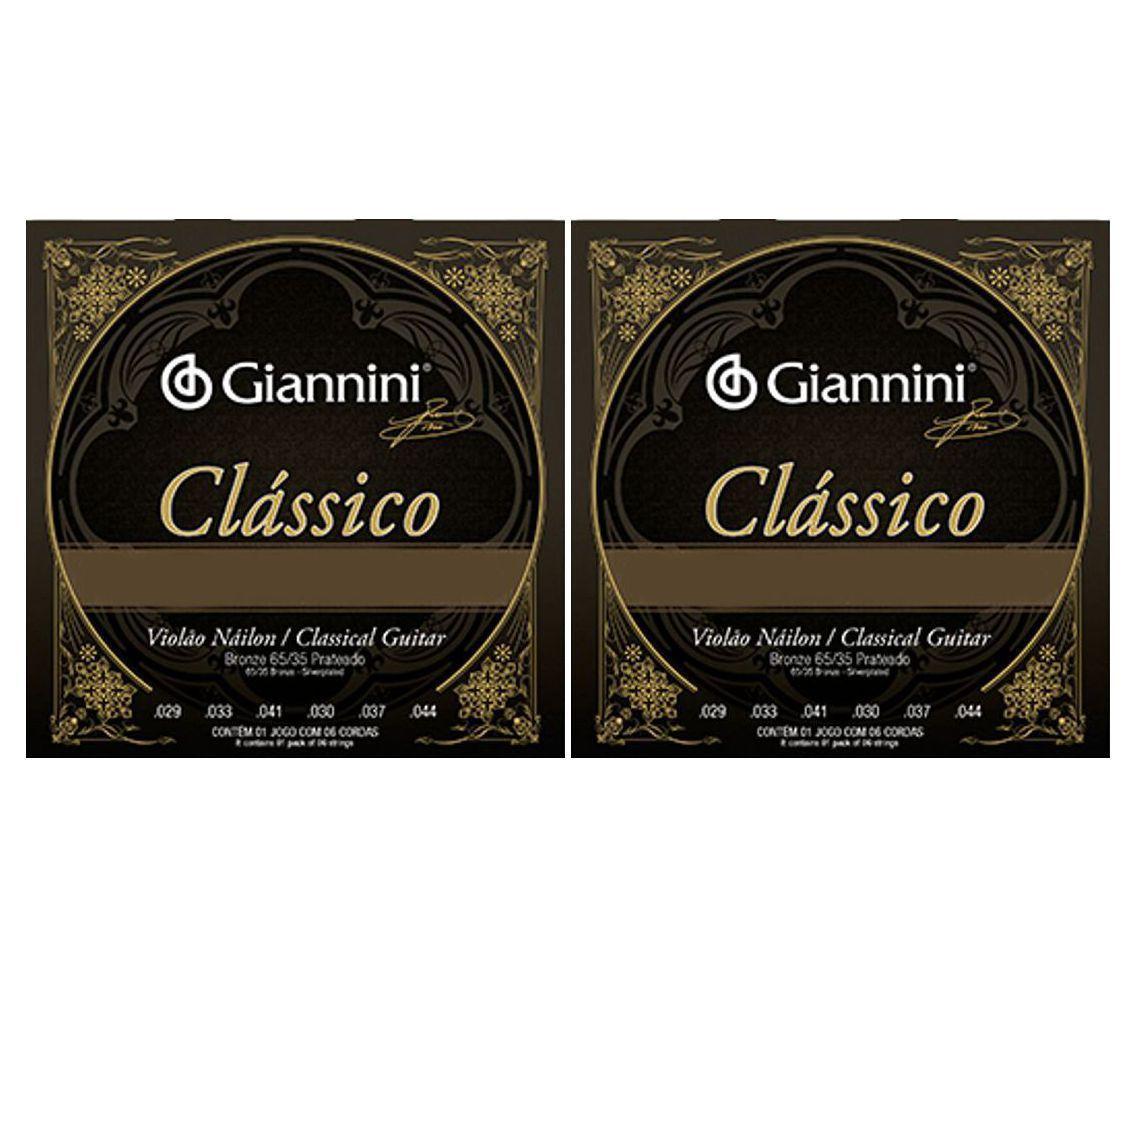 Encordoamento Giannini Classico NYLON - Cordas de NYLON para Violão - 02 Jogos